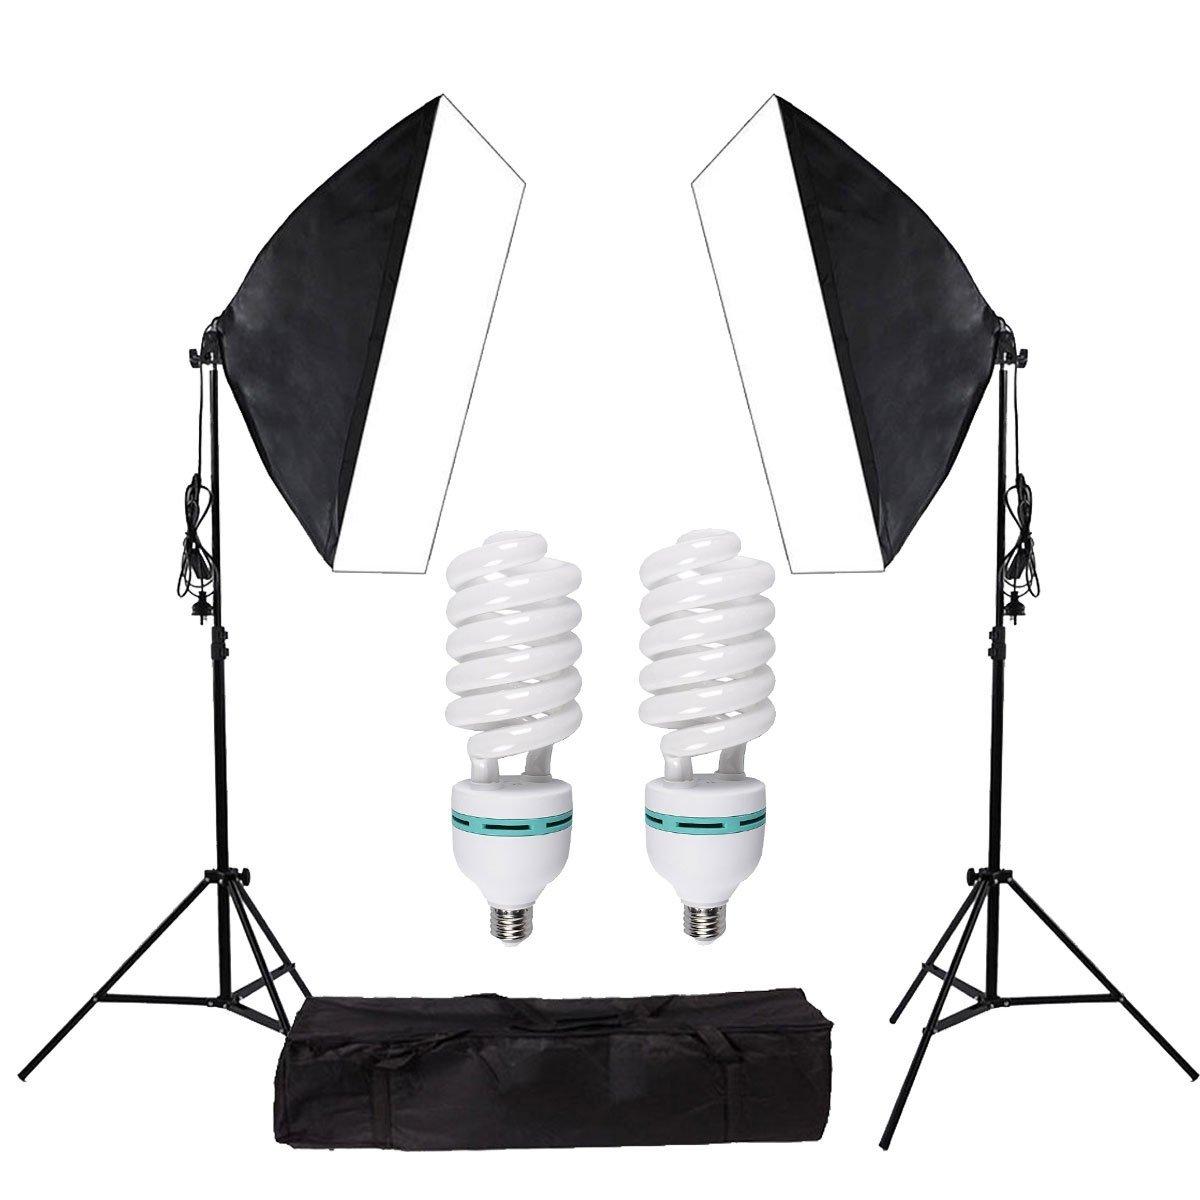 "YISITONG 1350W Photography Softbox Soft box Light Lighting Kit Photo Equipment Soft Studio Light Softbox 20""X28""/ 50x70 cm"